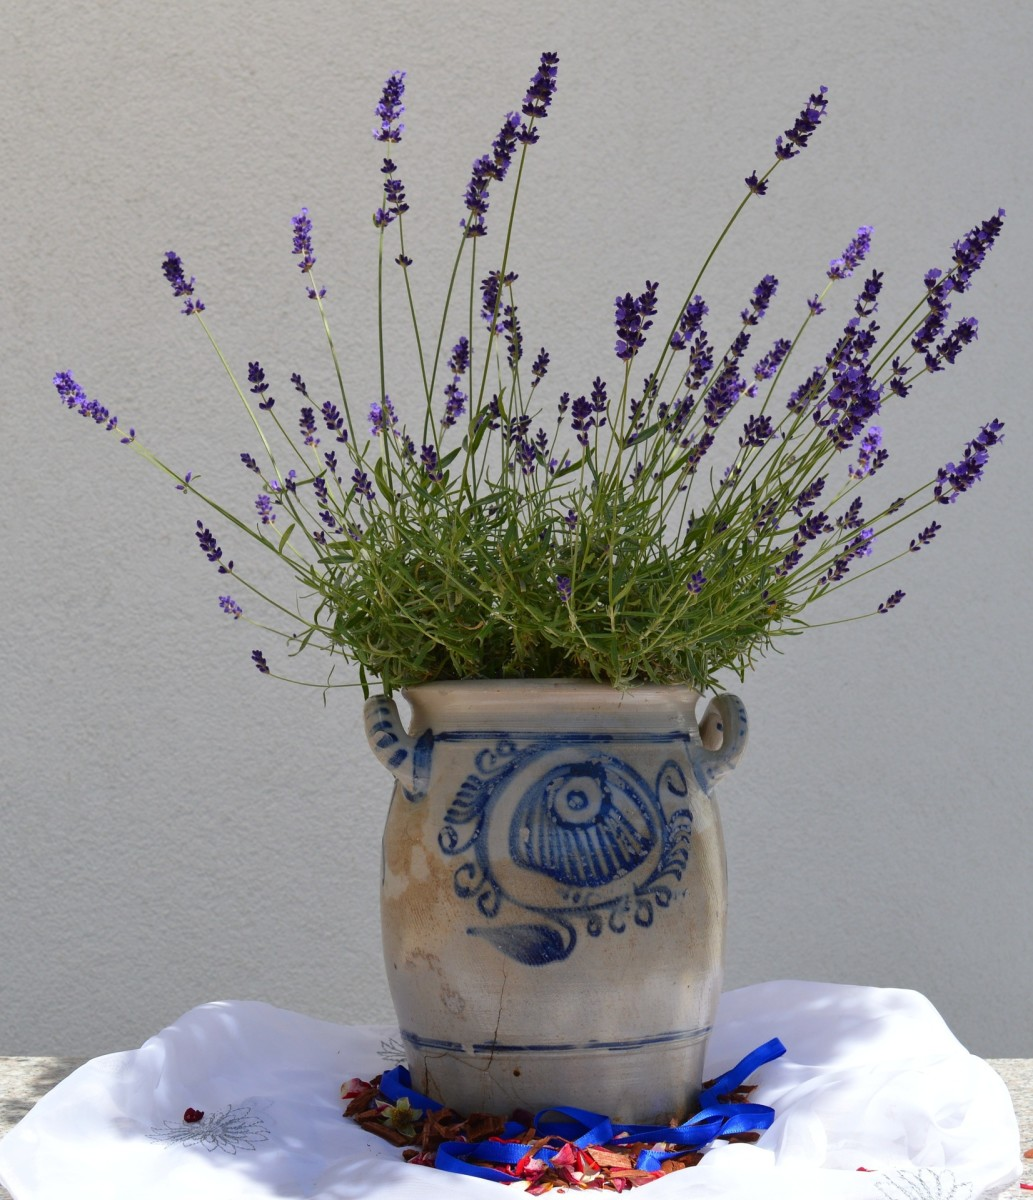 Plant lavender in a decorative pot.